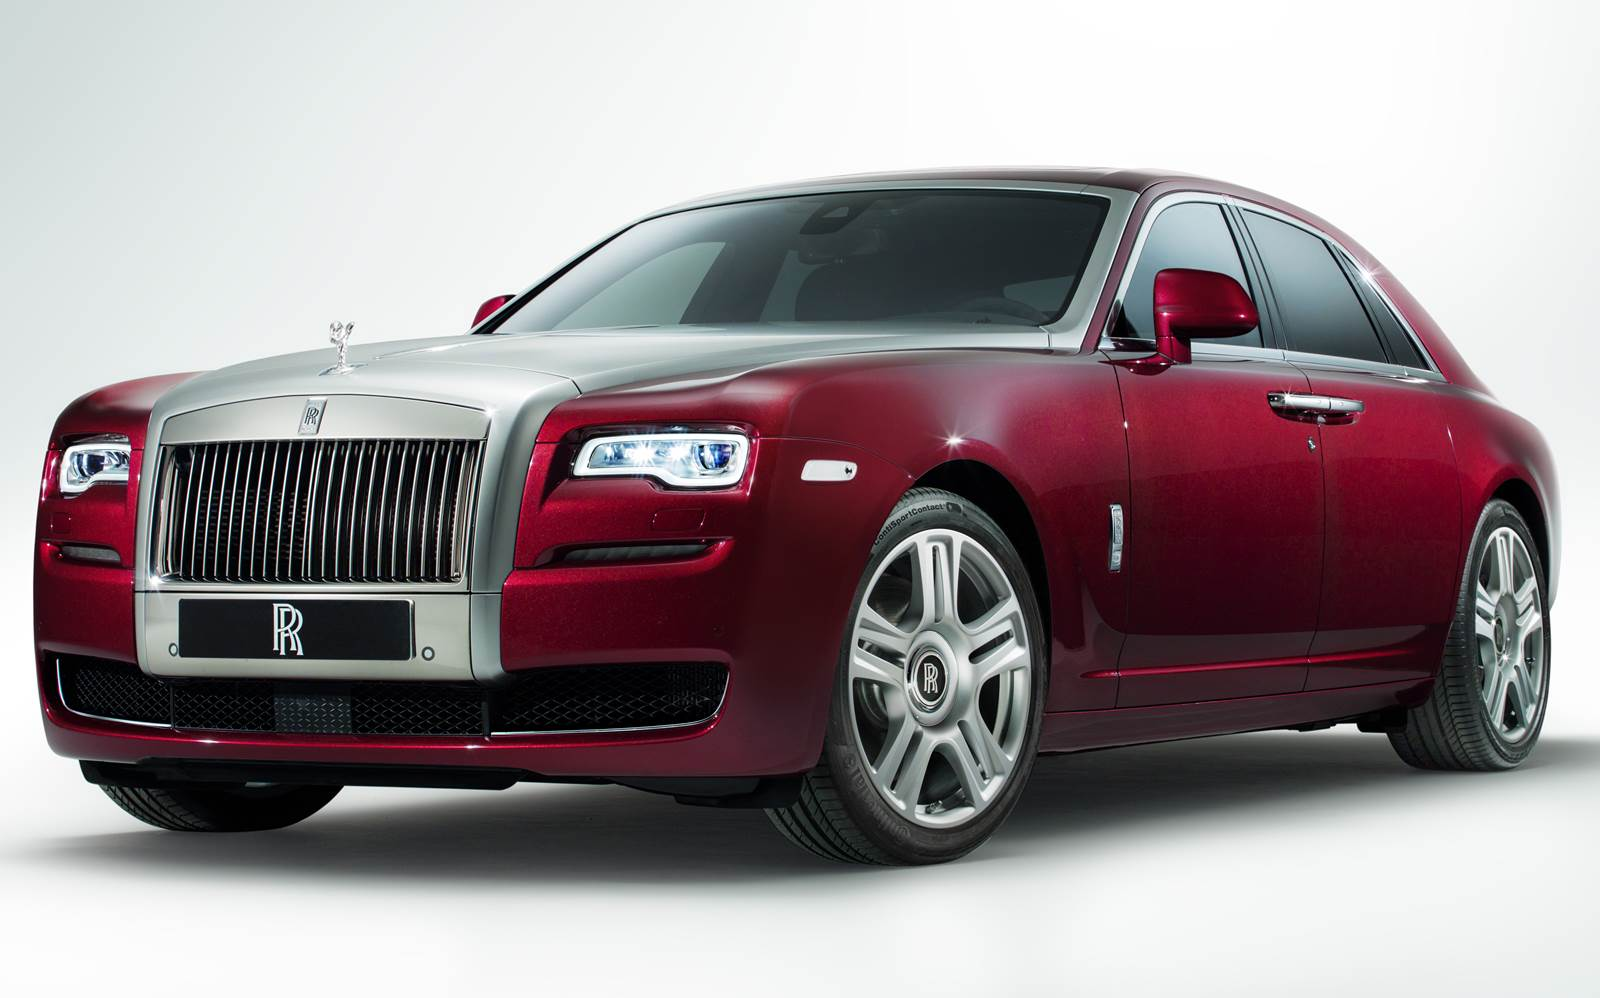 Rolls Royce Ghost Série II